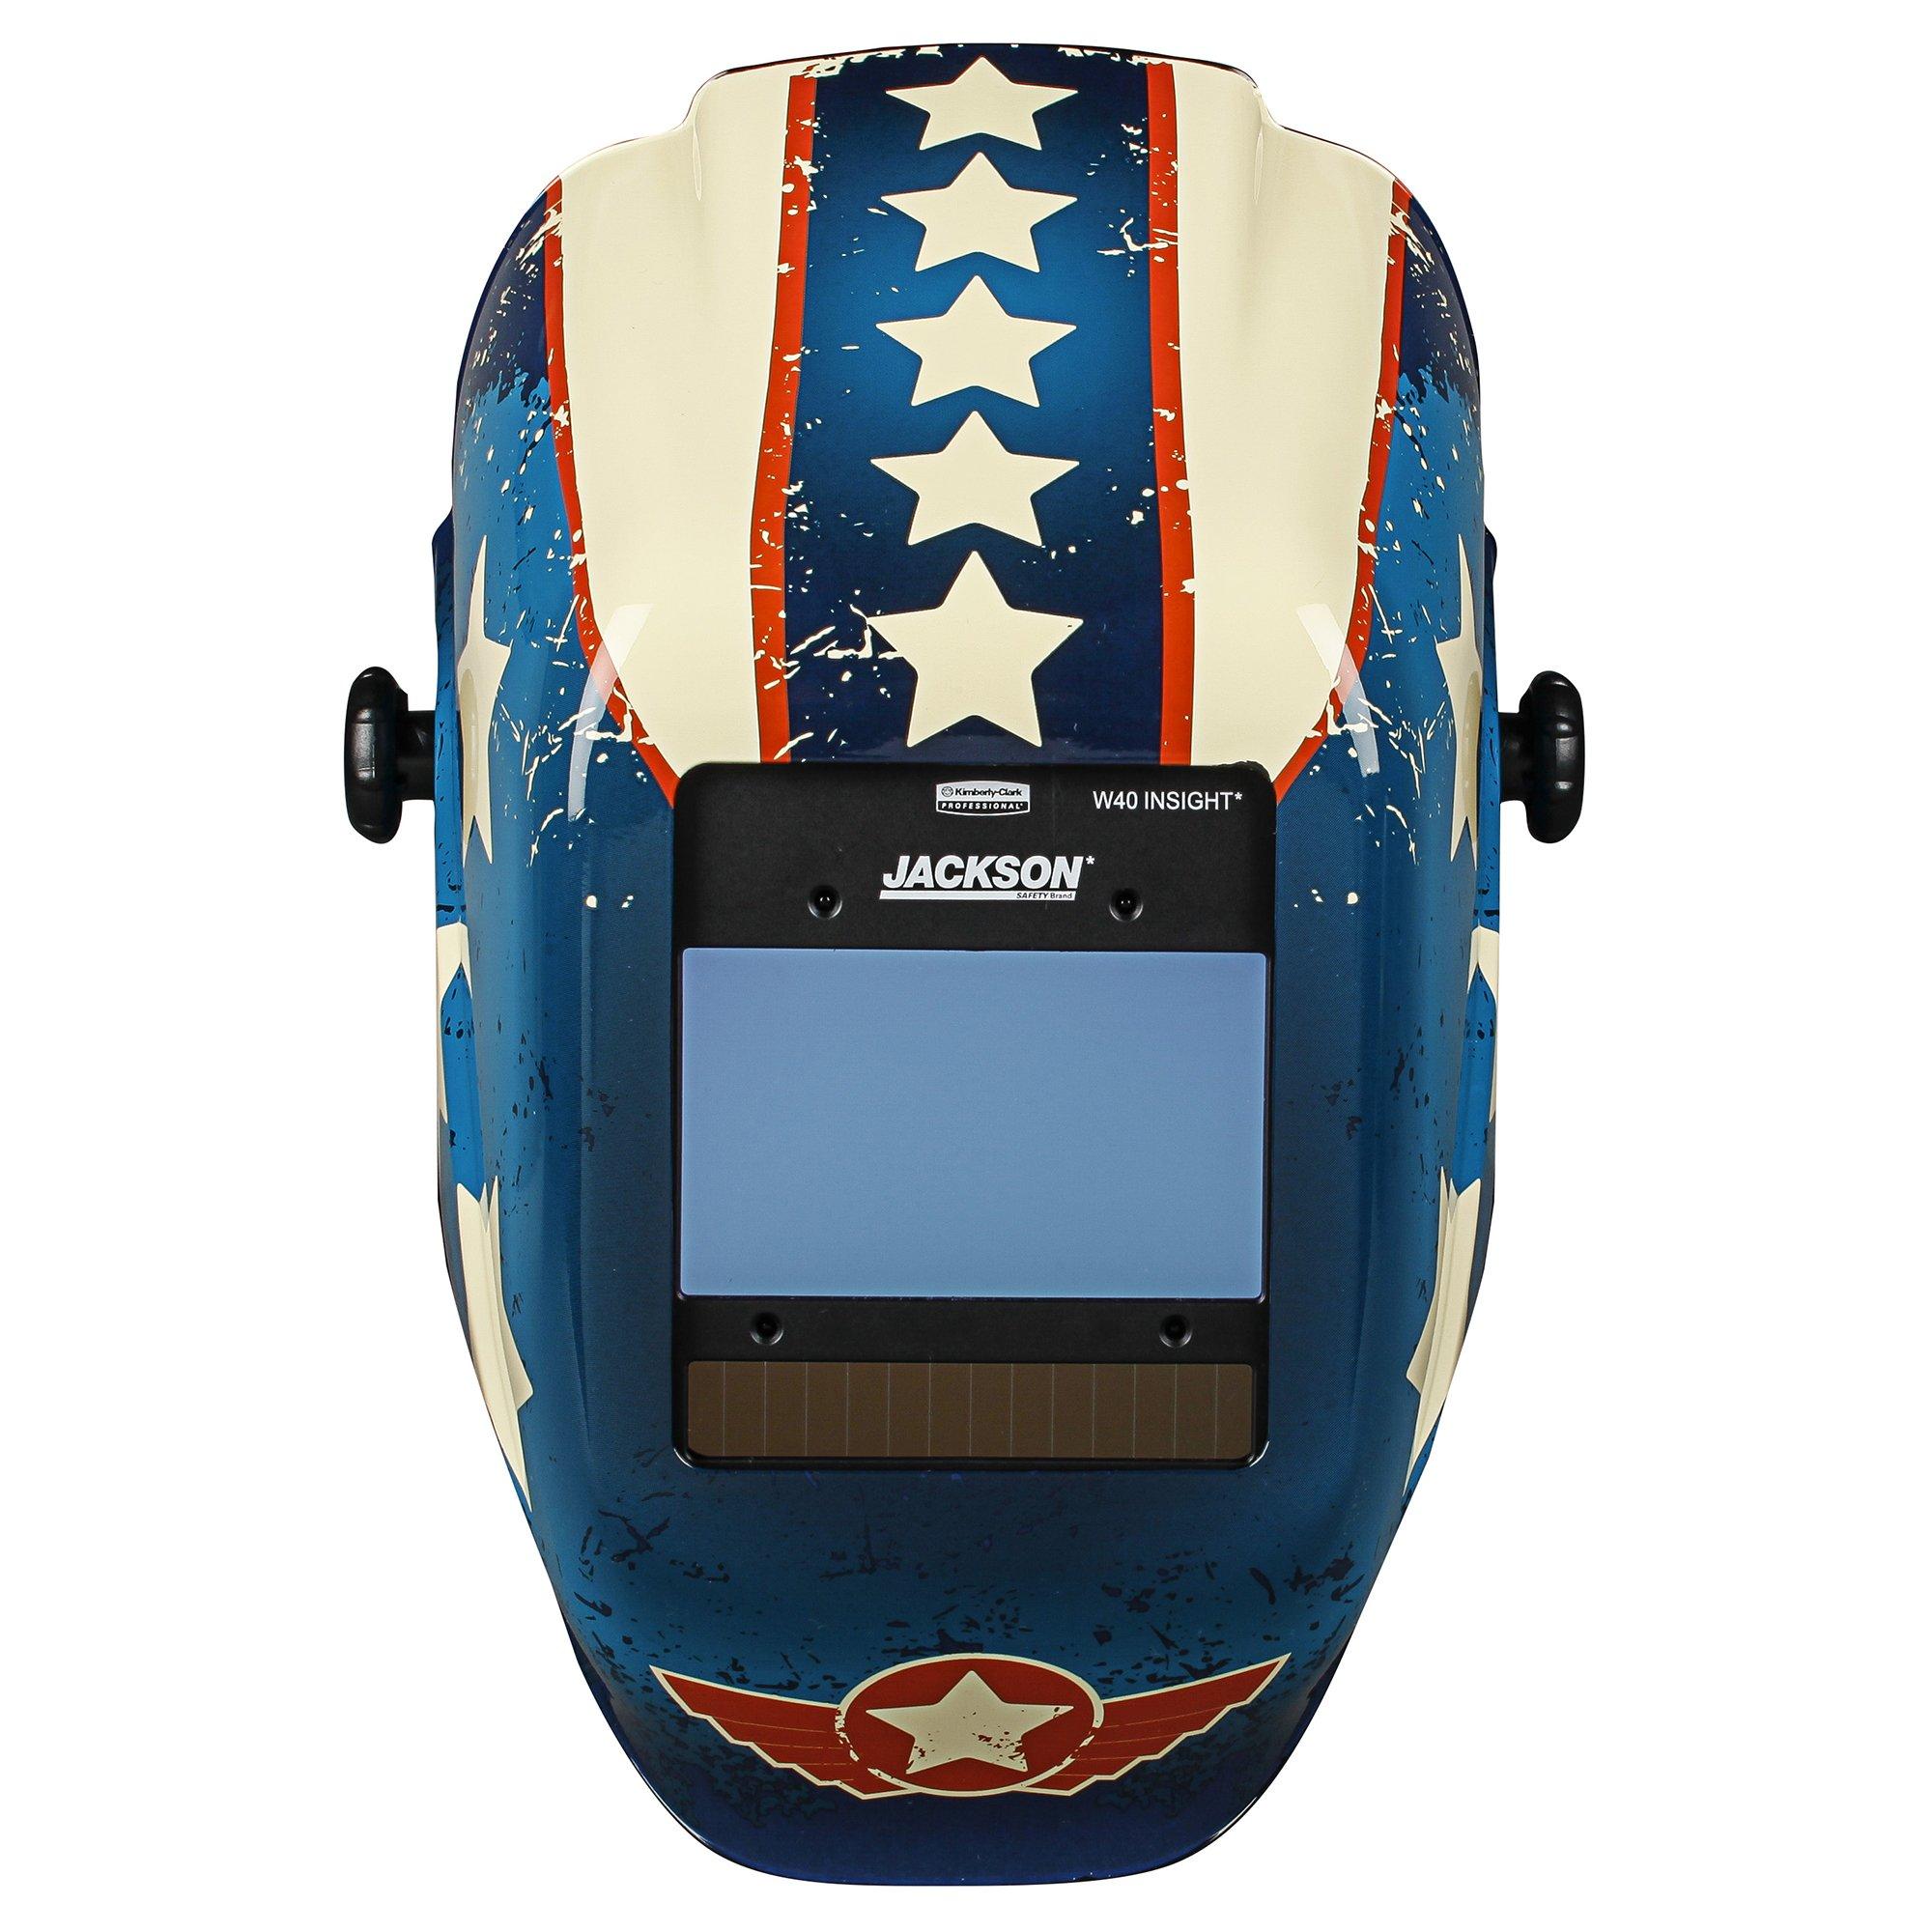 Jackson Safety Insight Variable Auto Darkening Welding Helmet (46101), HLX, 370 Comfortable Headgear, Ultra-Light Shell, Stars & Scars, 1 Helmet by Jackson Safety (Image #2)